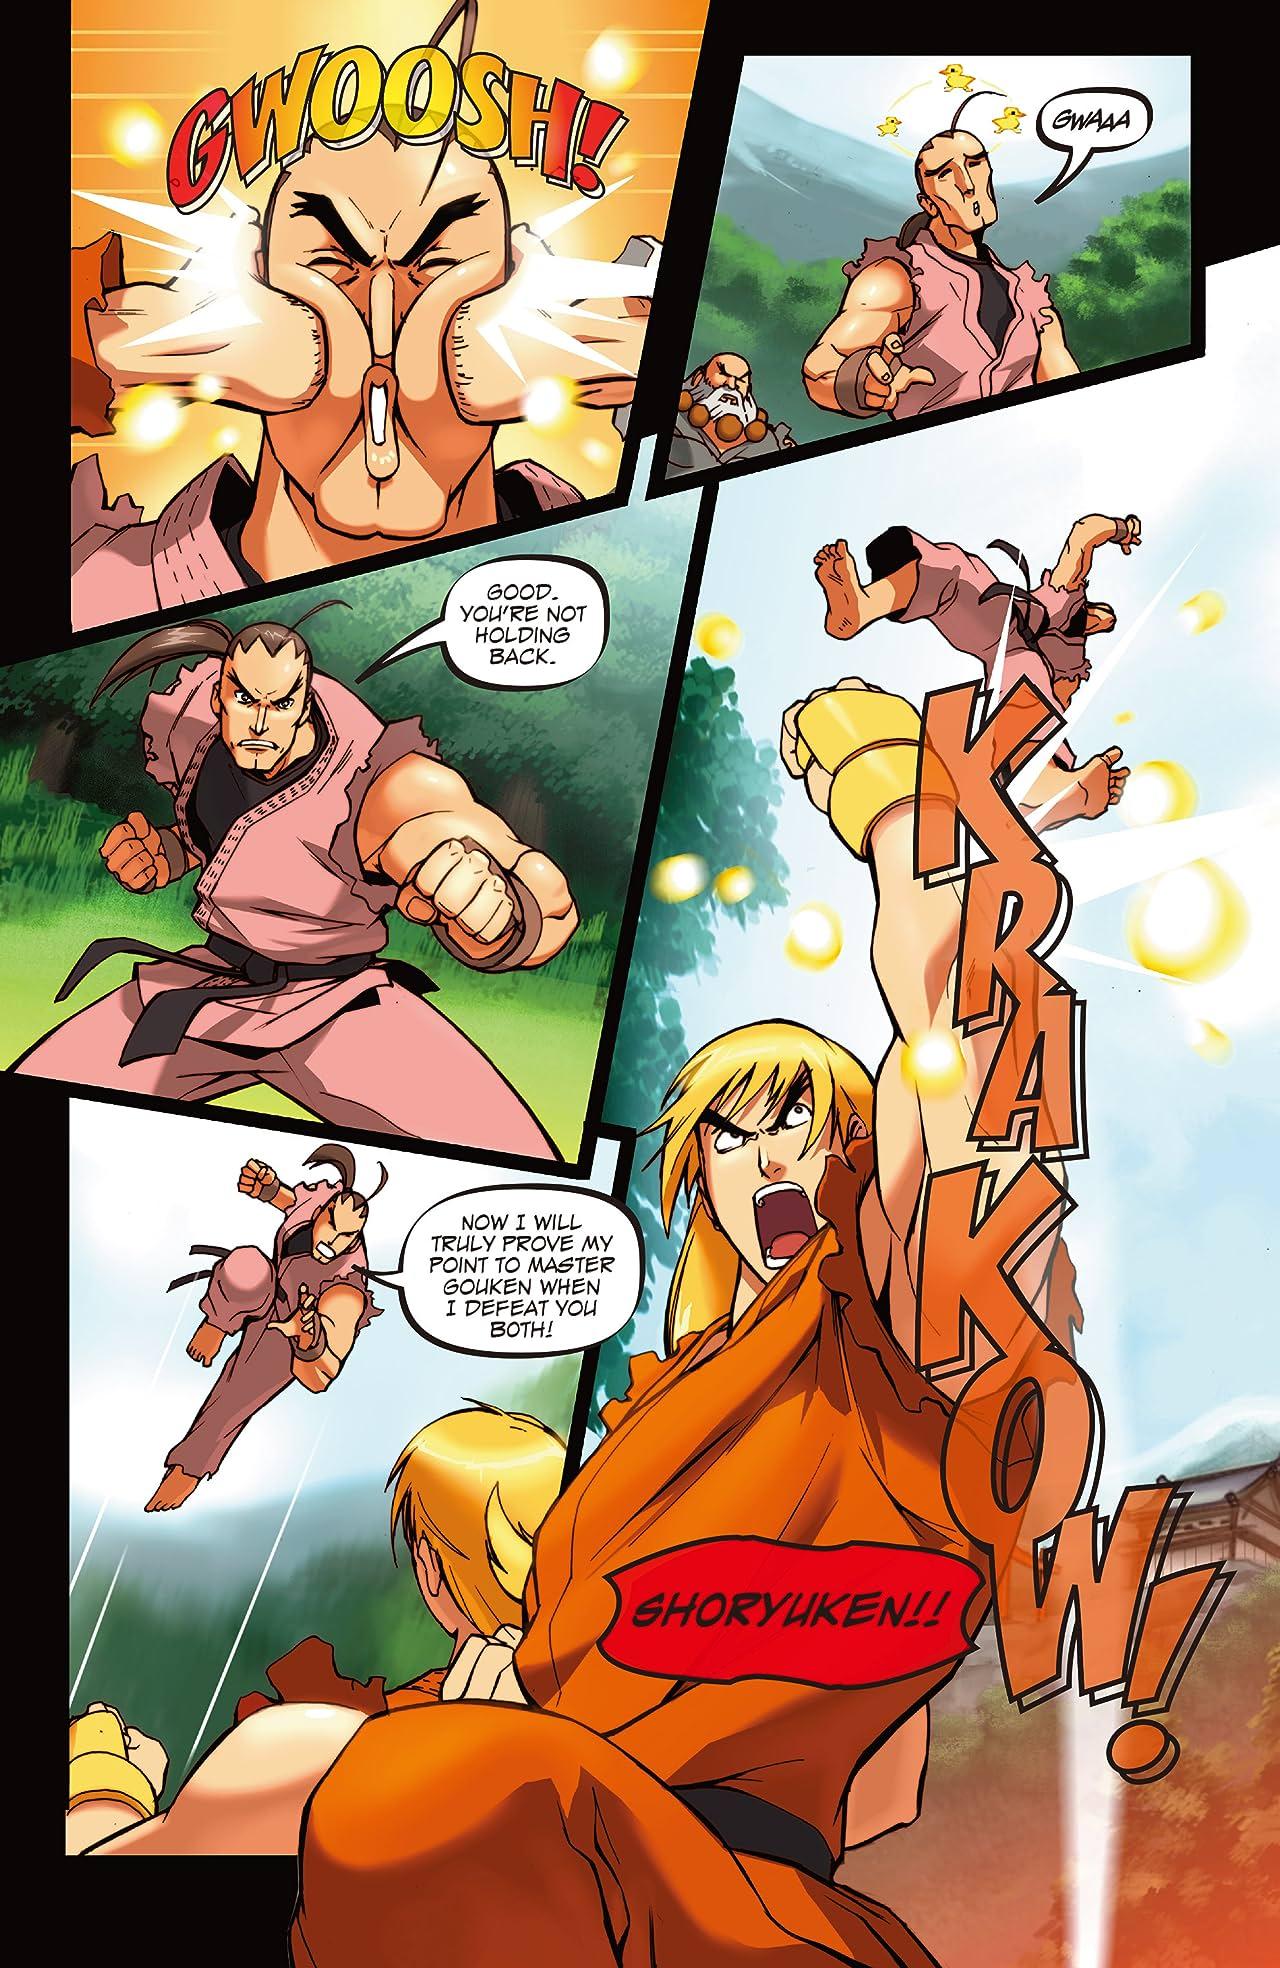 Street Fighter Legends: Sakura #2 (of 4)